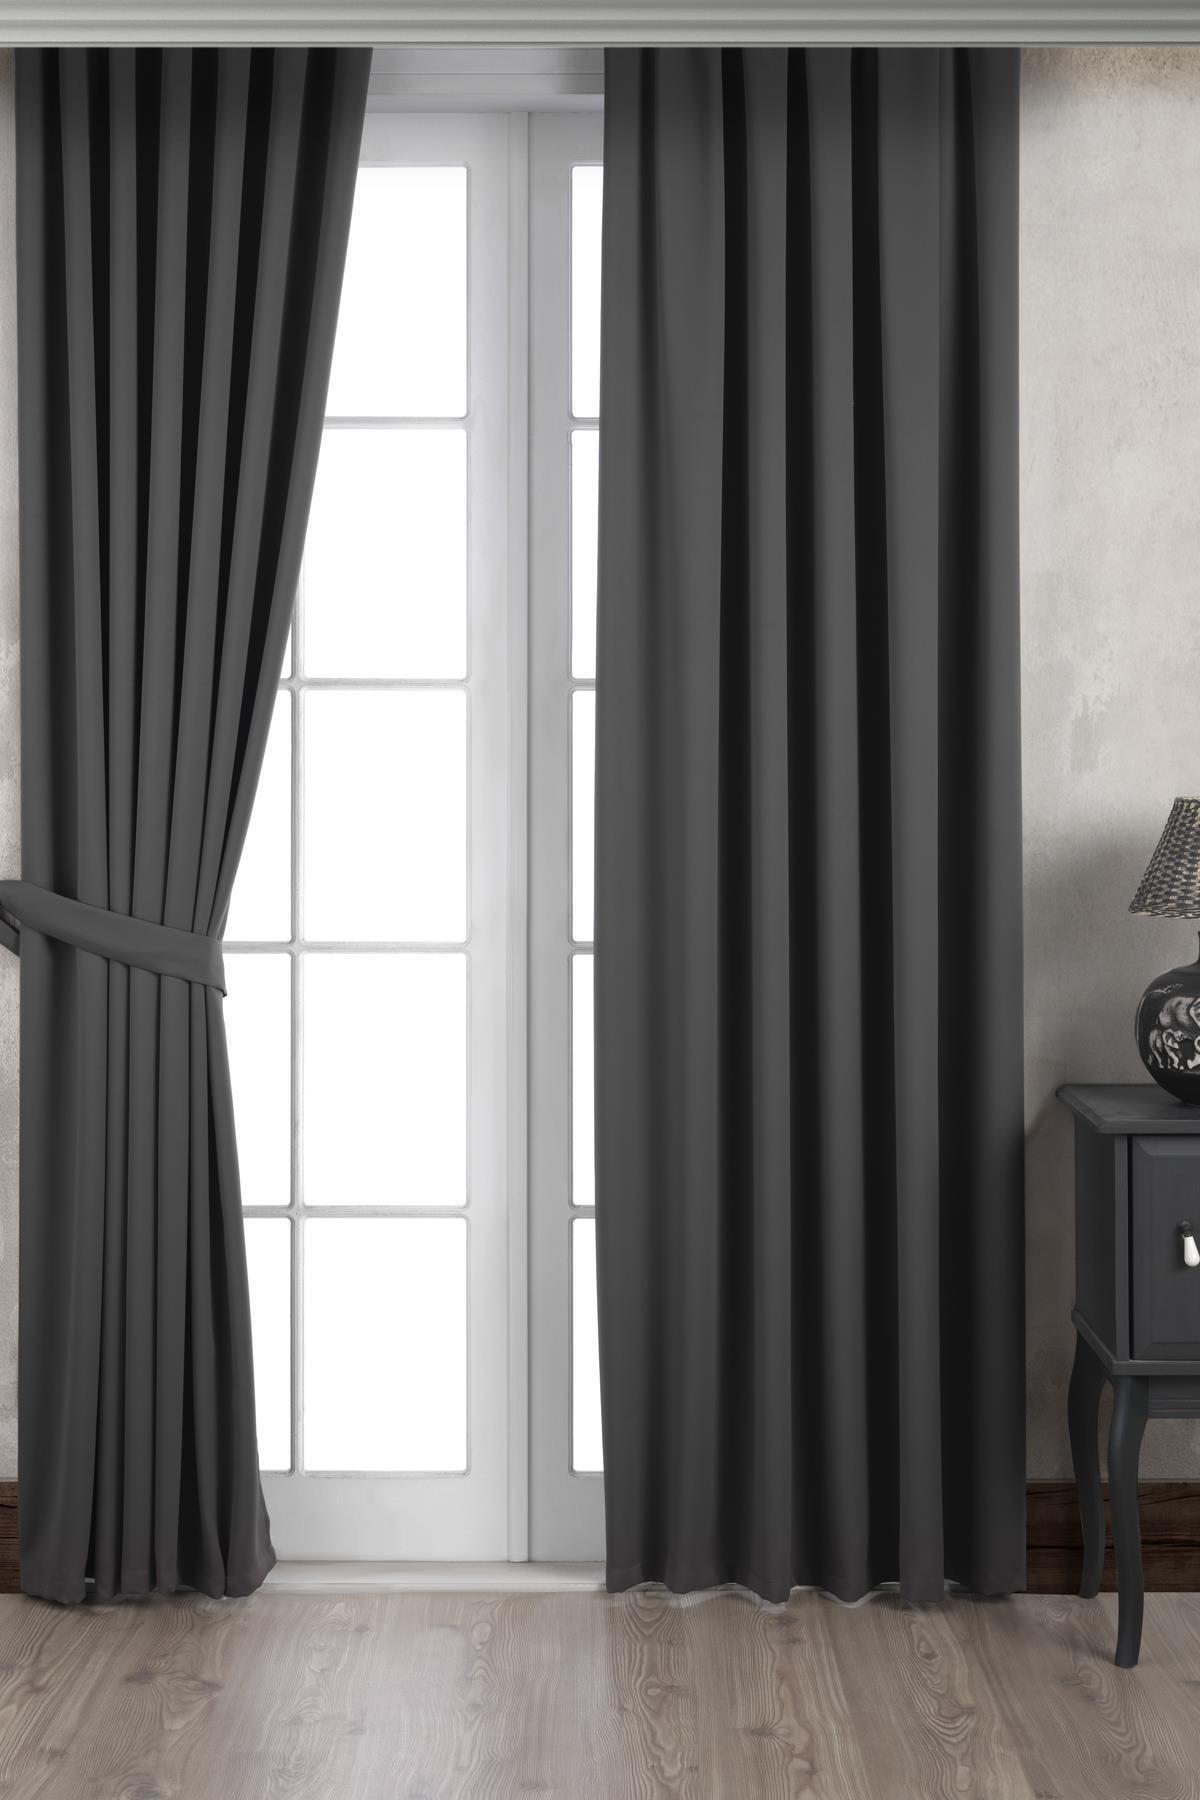 Blackout Fon Perde 150x230 cm